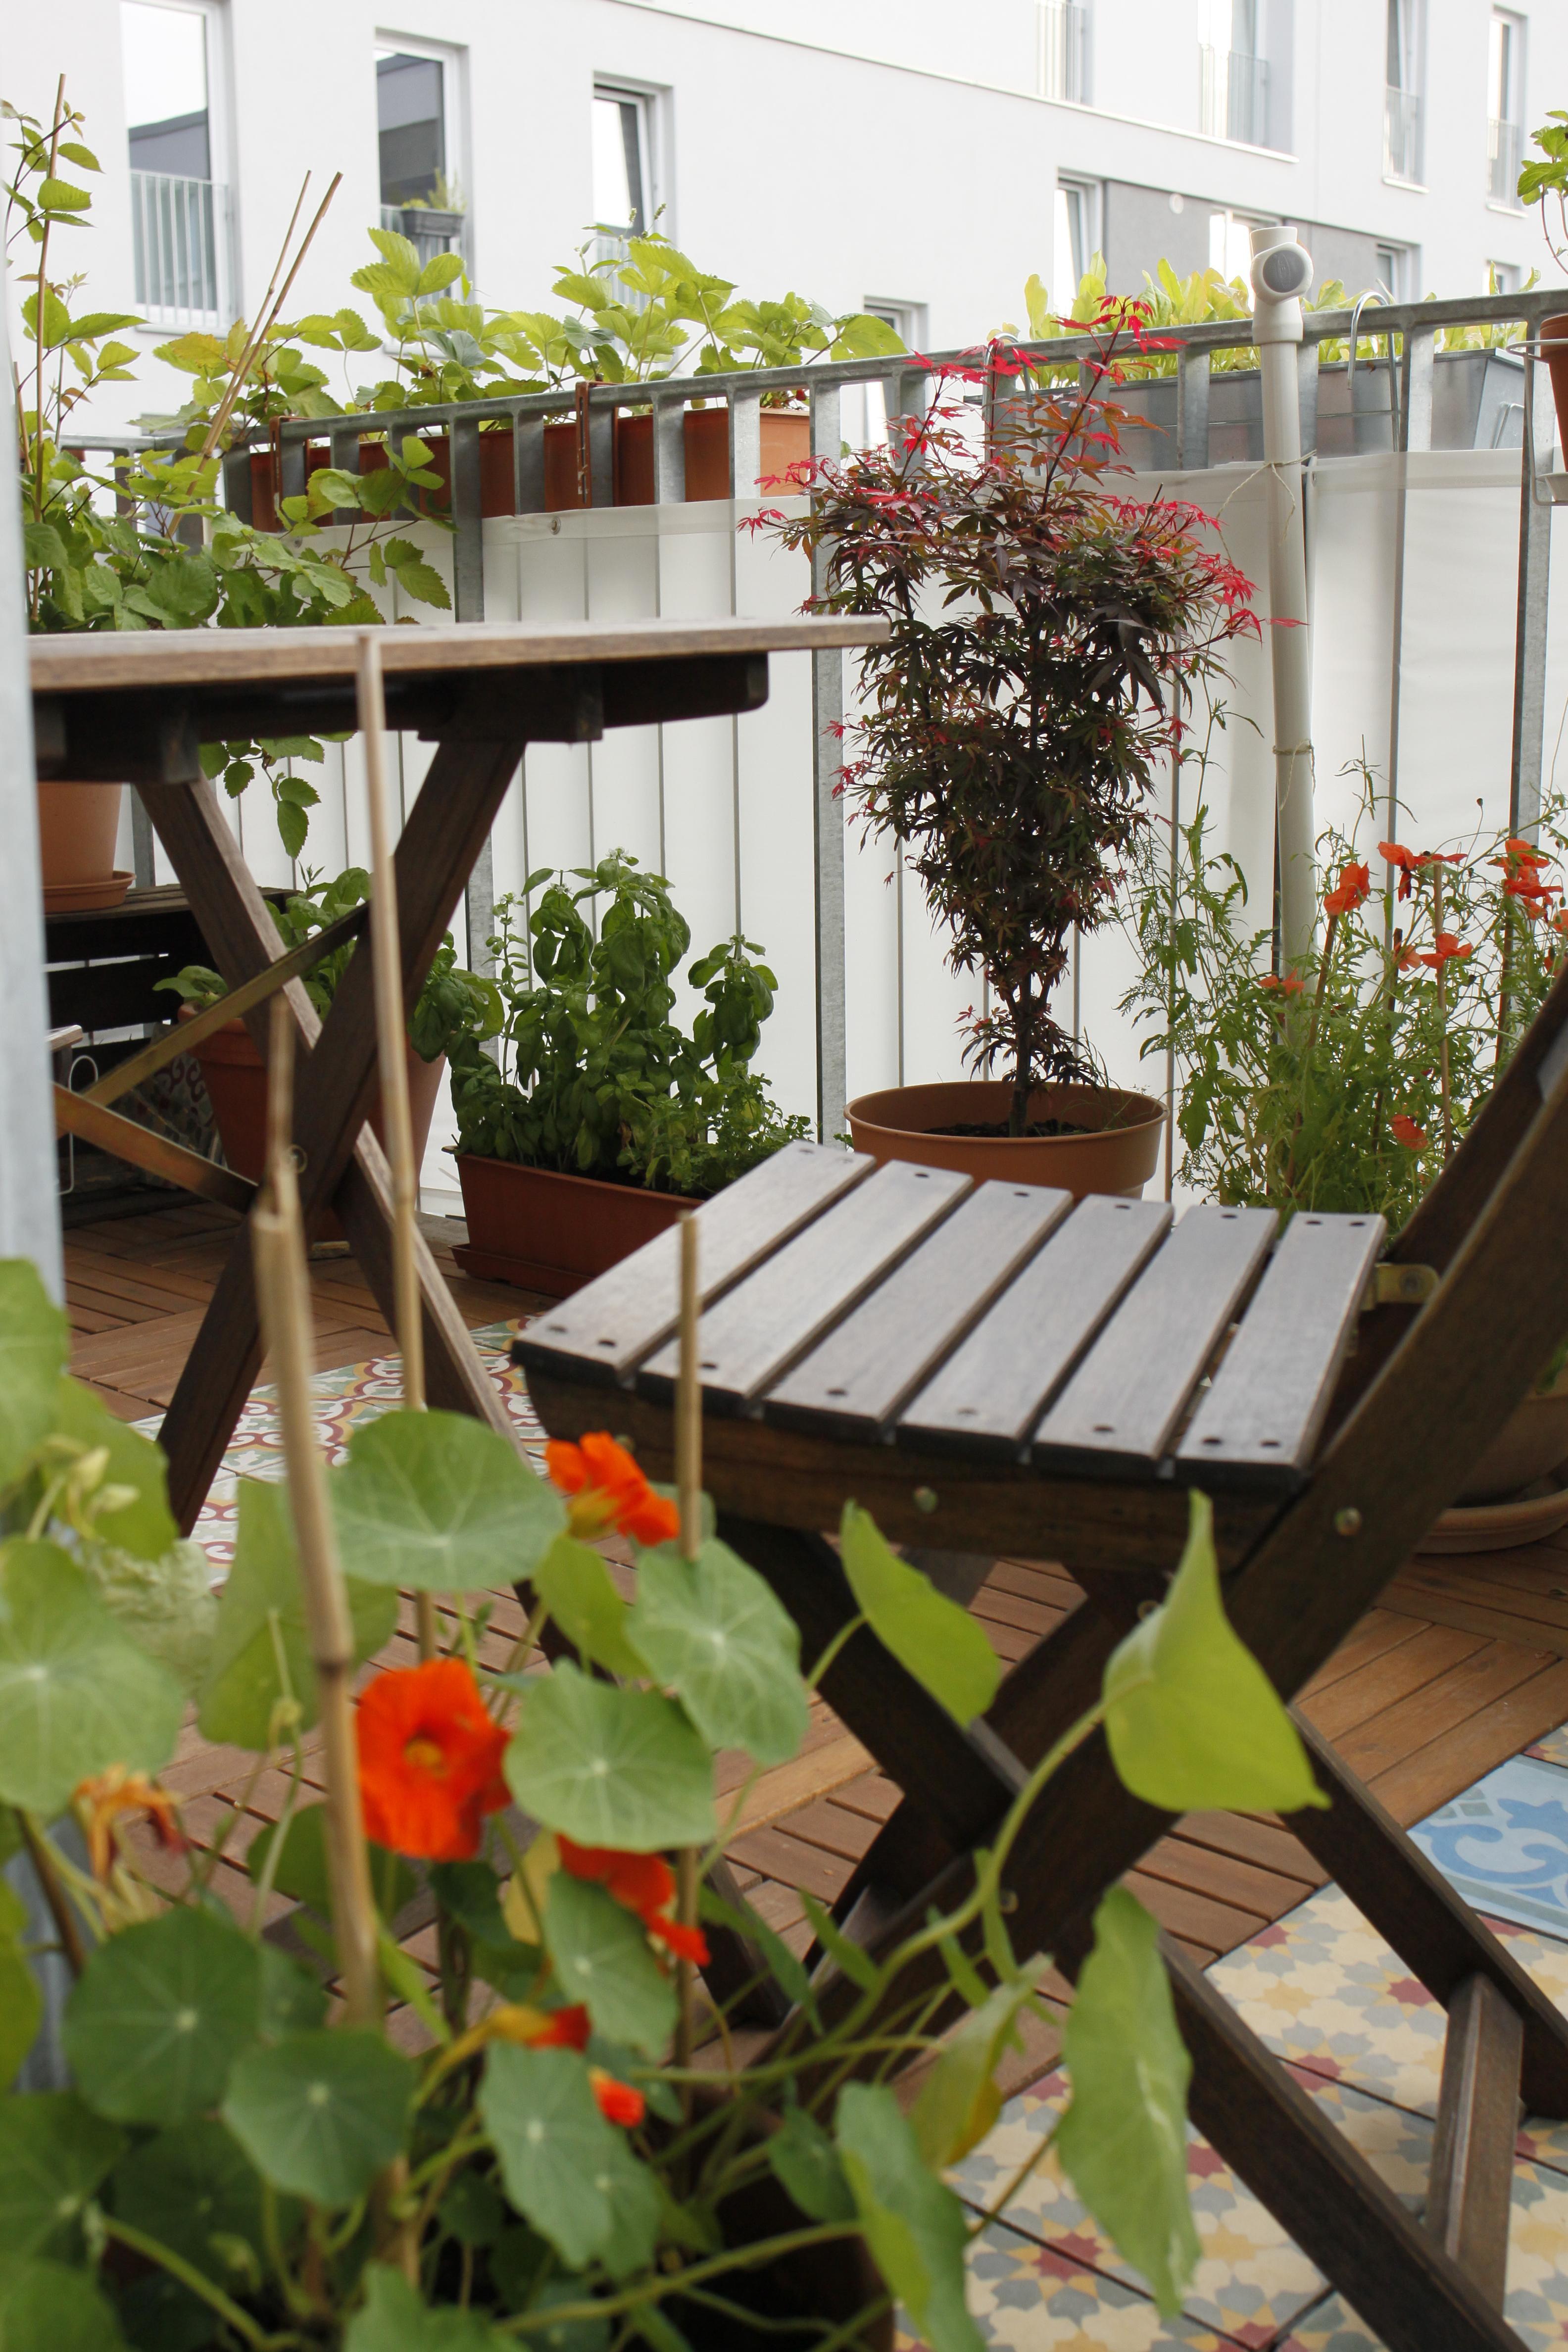 sitzecke garten • bilder & ideen • couchstyle, Gartenarbeit ideen